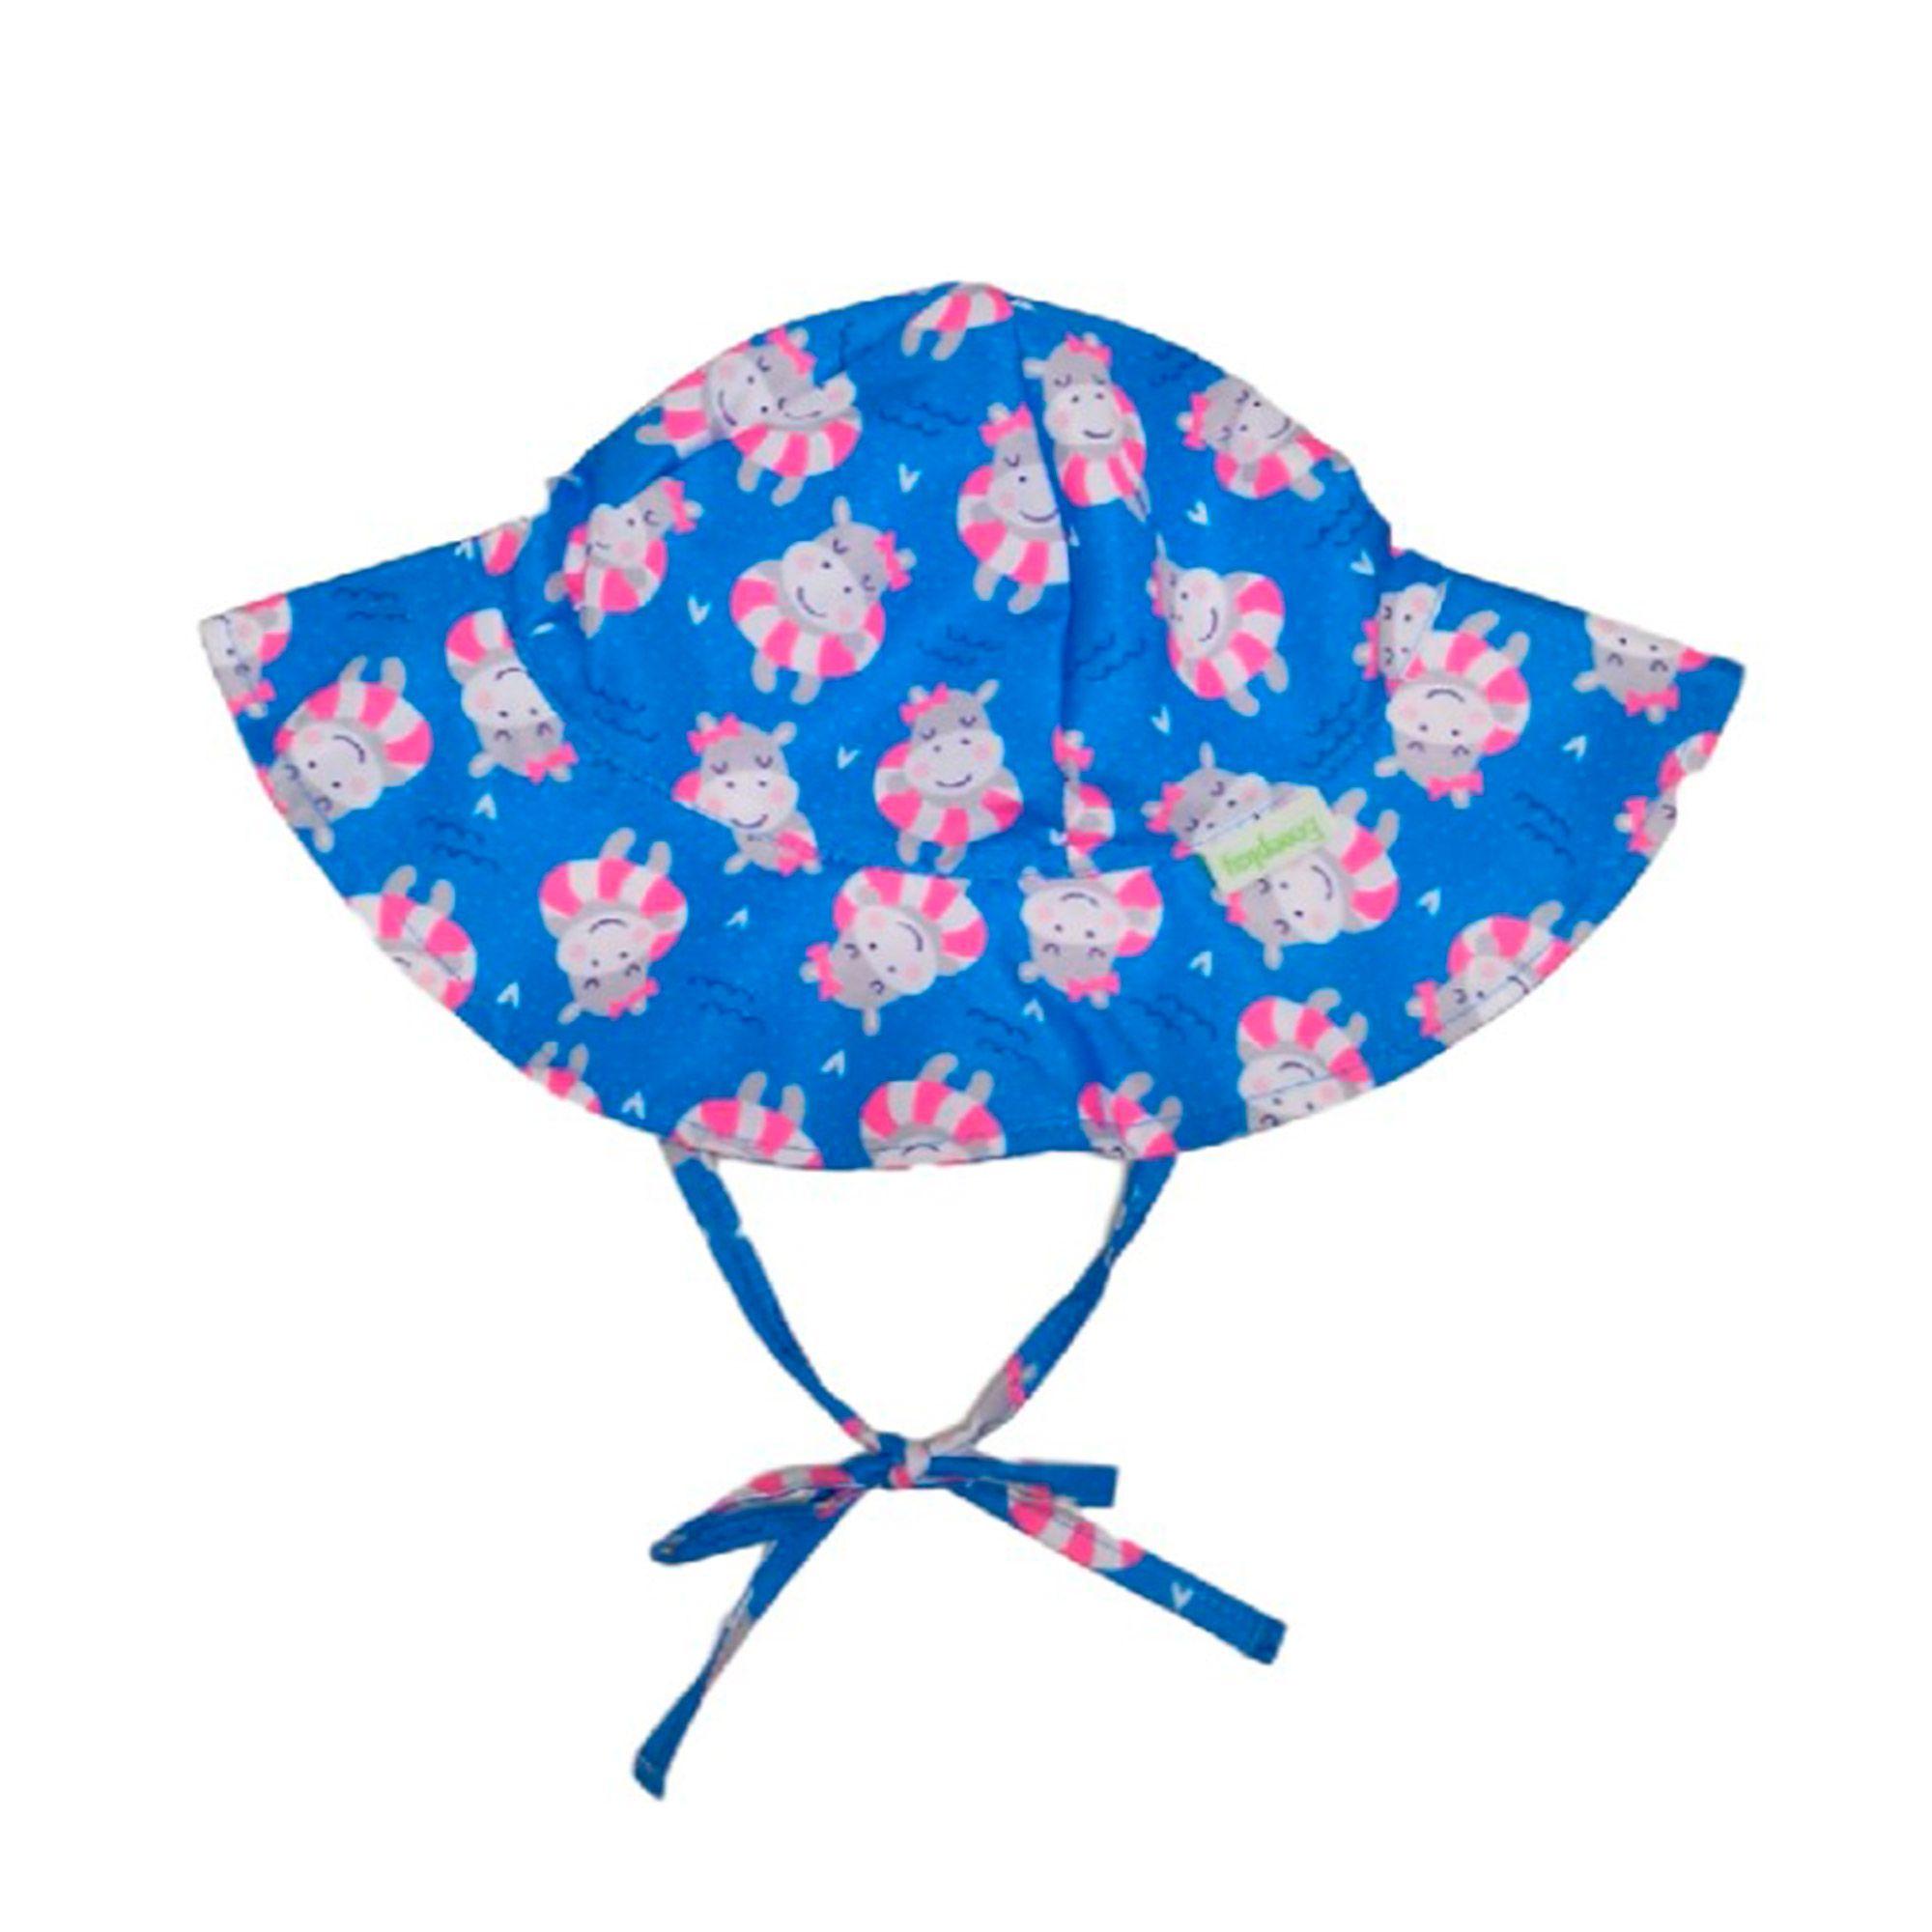 Ecoeplay - Chapéu de Praia - Popotinha - Tamanho G